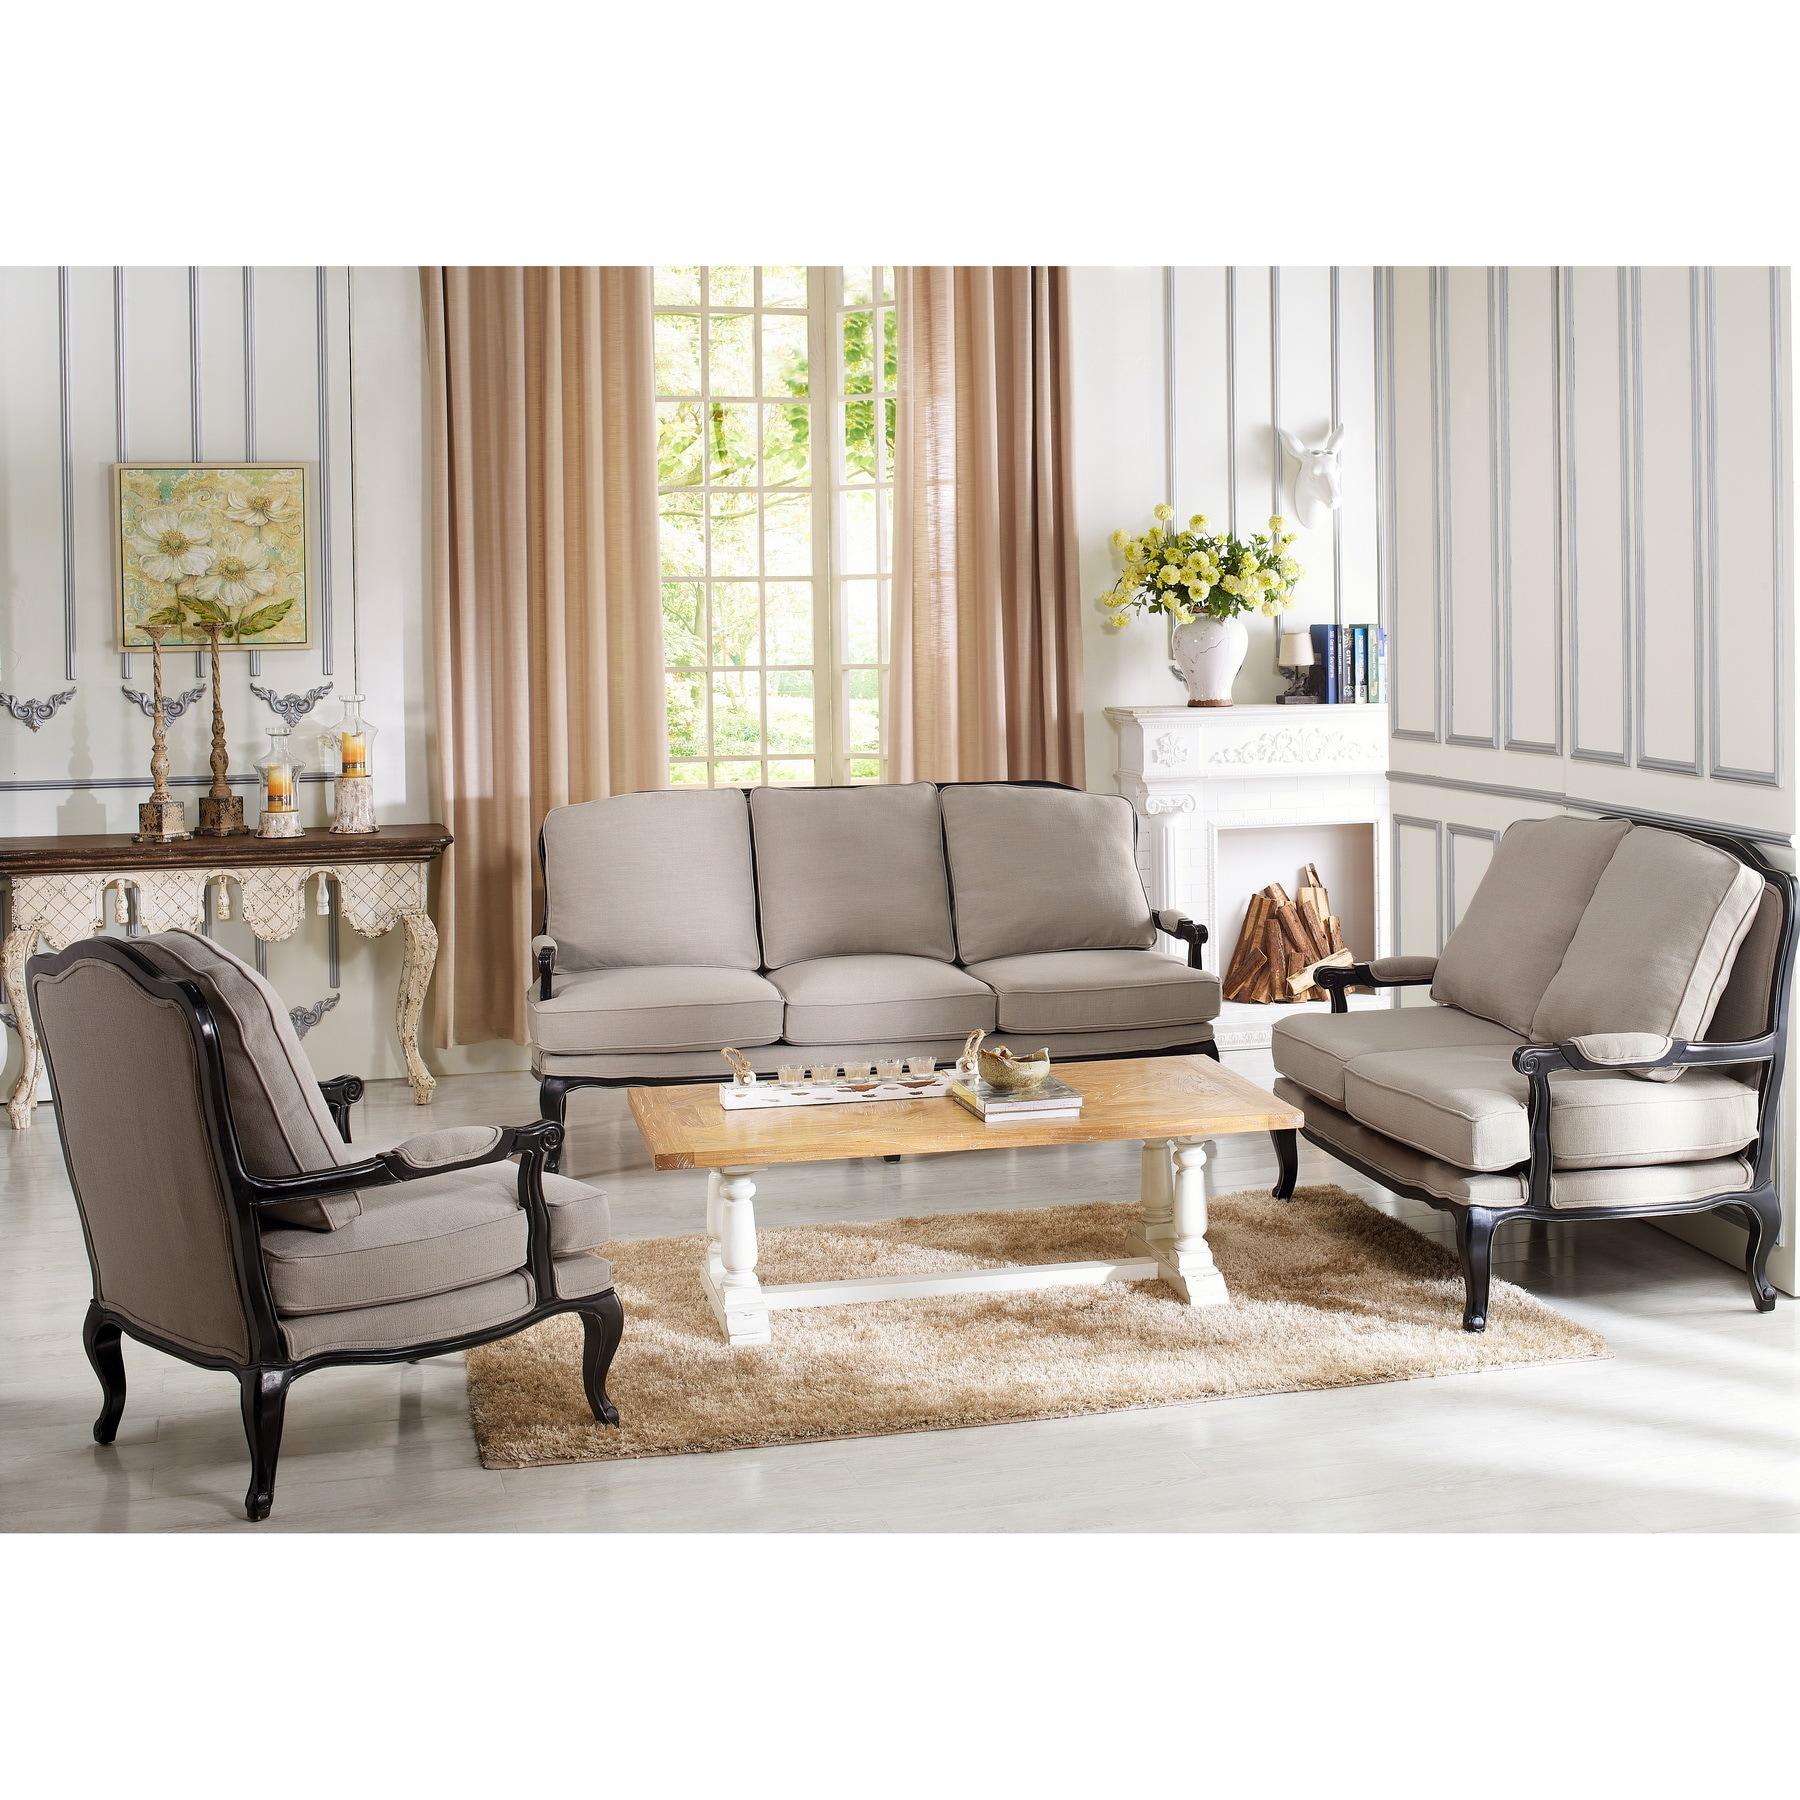 sofa set deals ~ baxton studio antoinette classic antiqued french sofa set